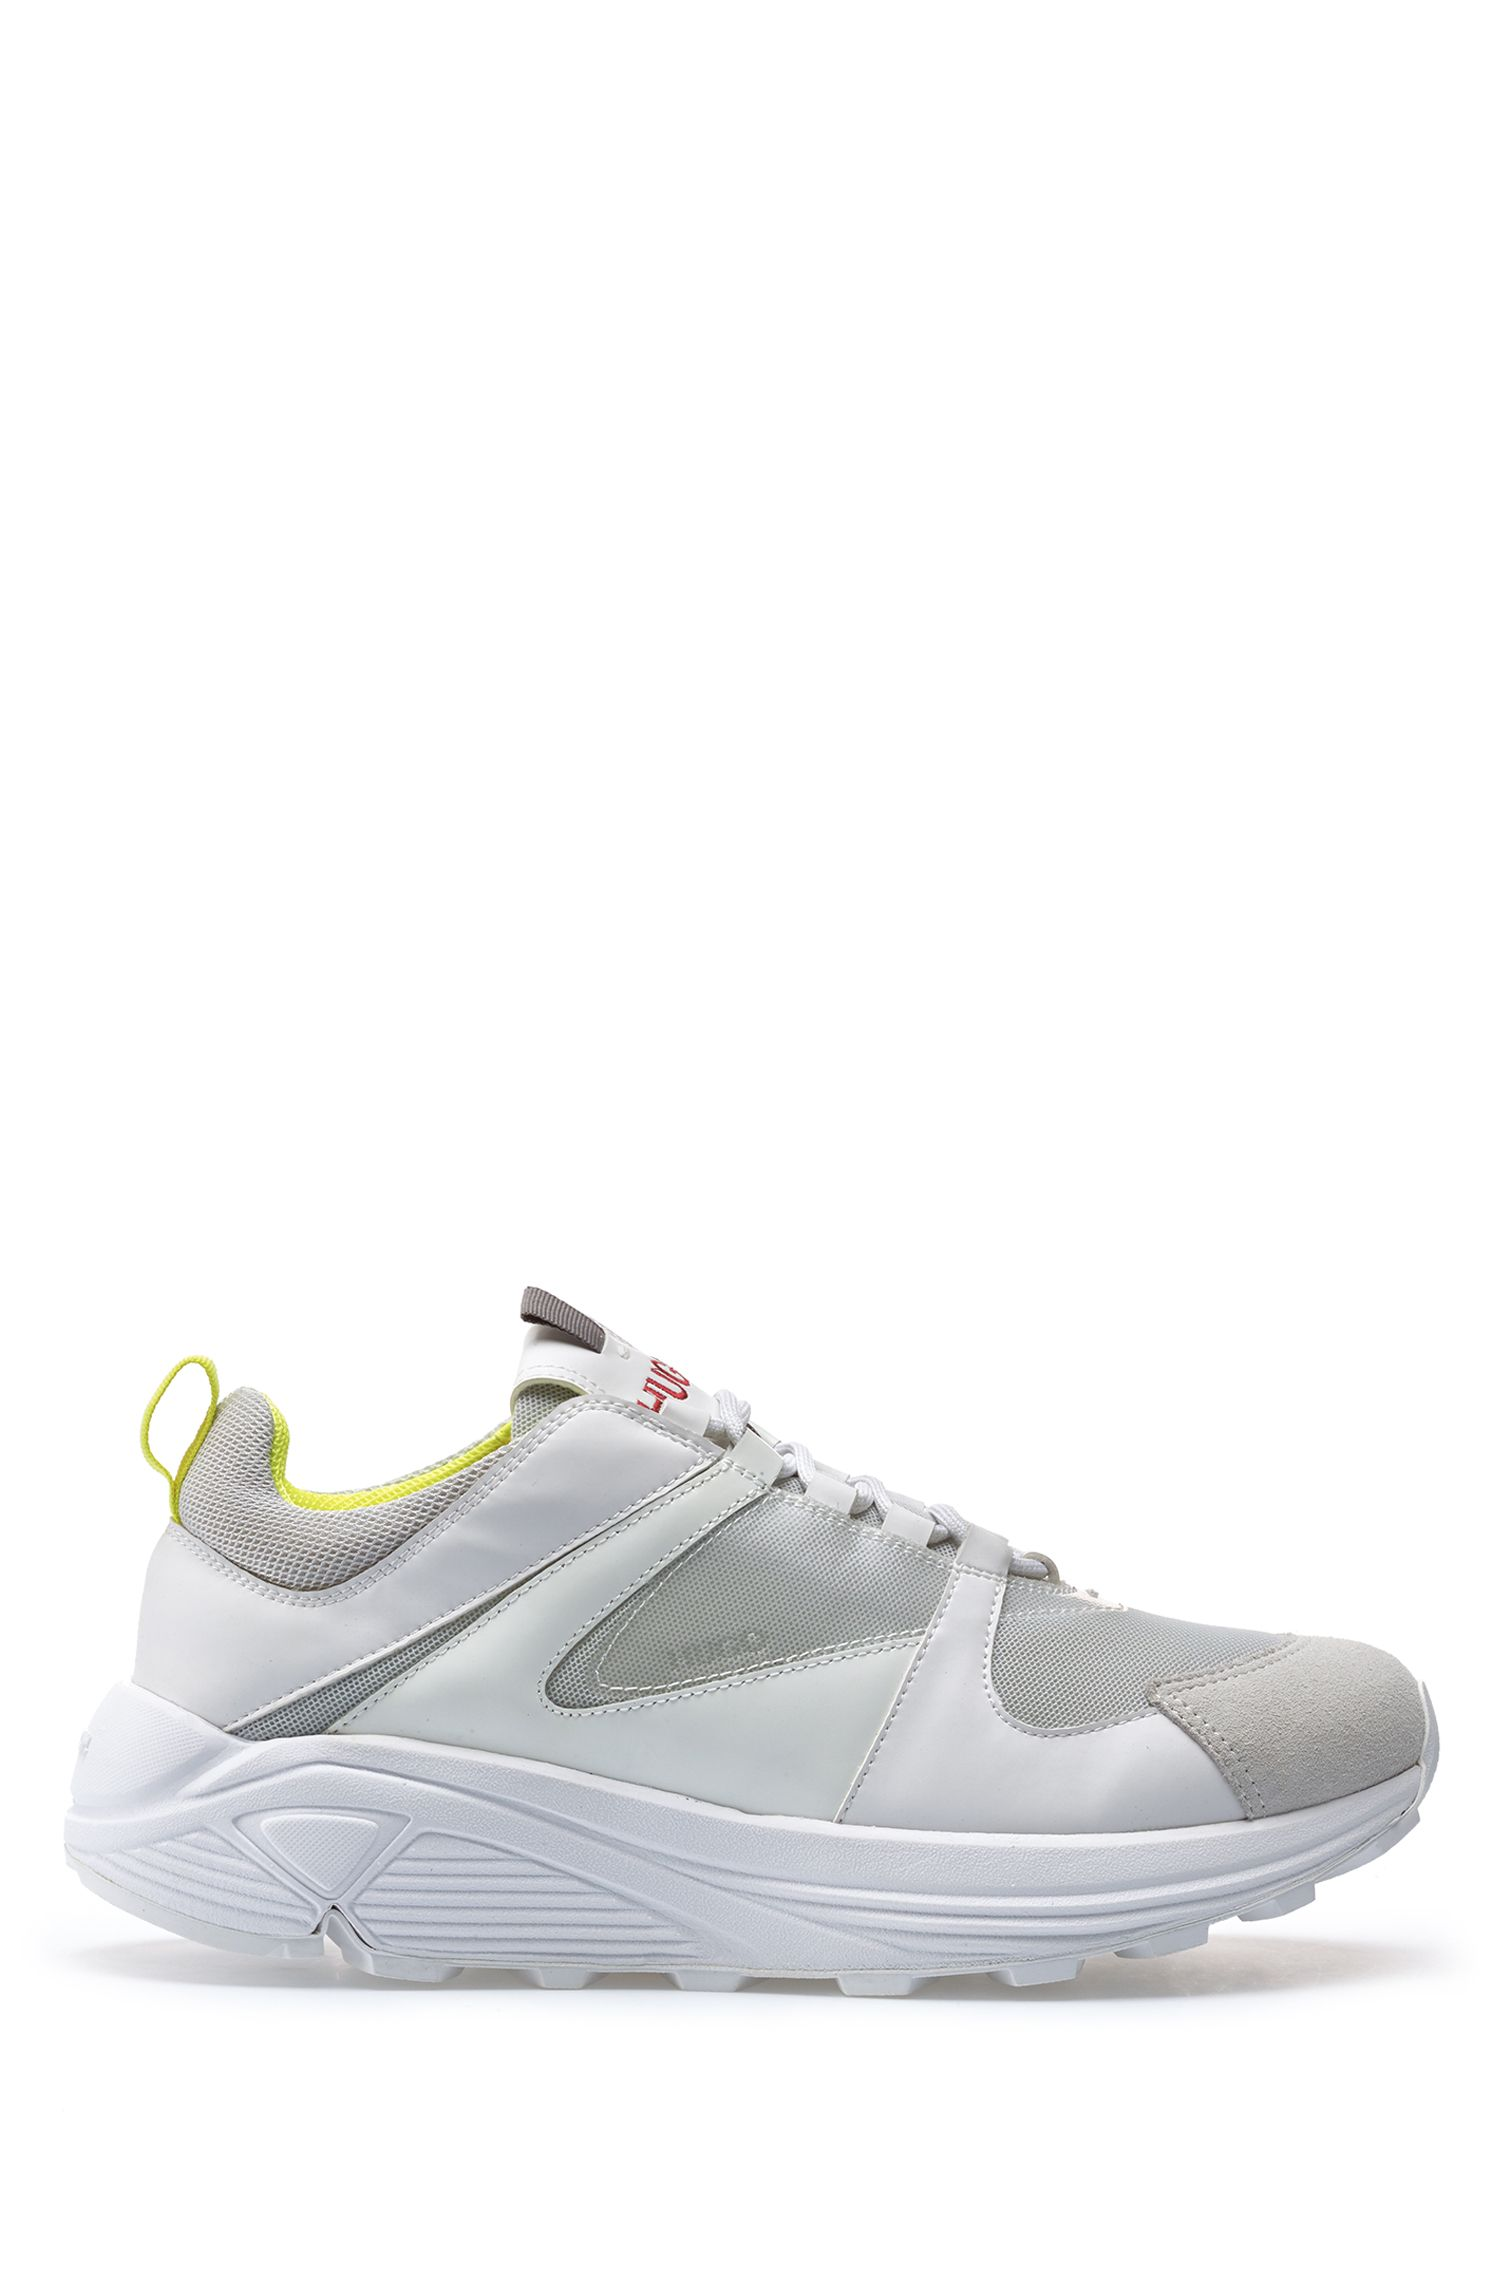 Hybride sneakers in hardloopstijl met Vibram-zool, Wit